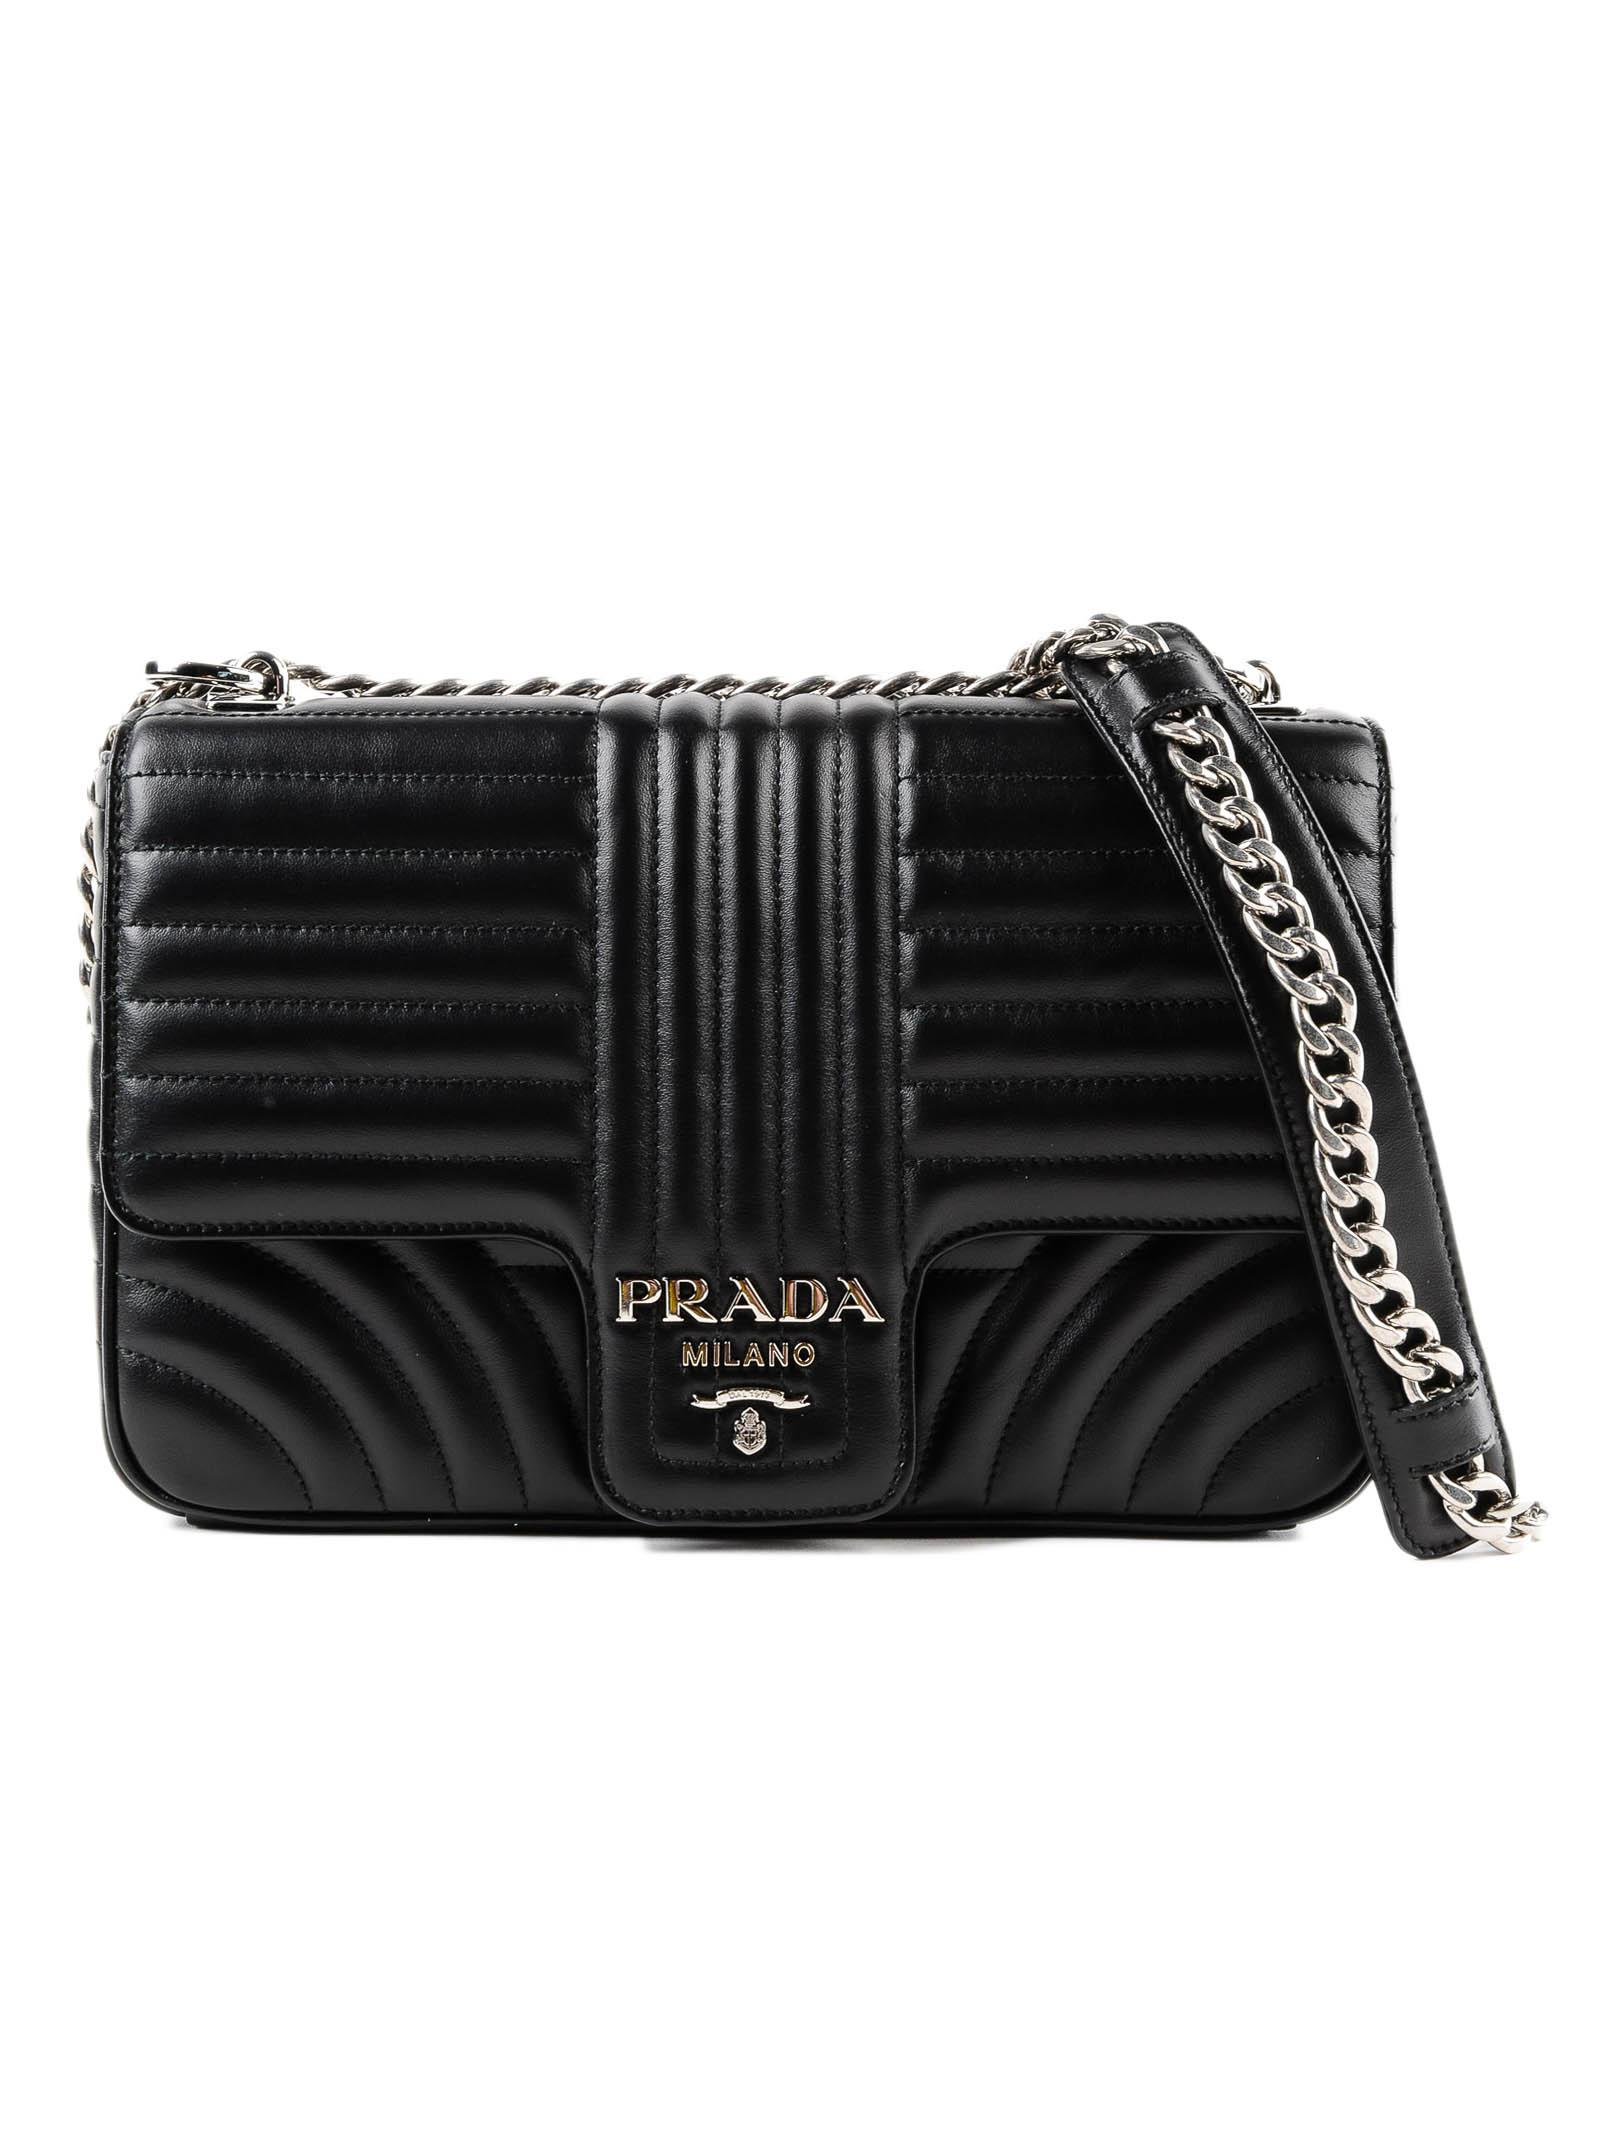 13456f4d0cf0 Lyst - Prada Diagramme Shoulder Bag in Black